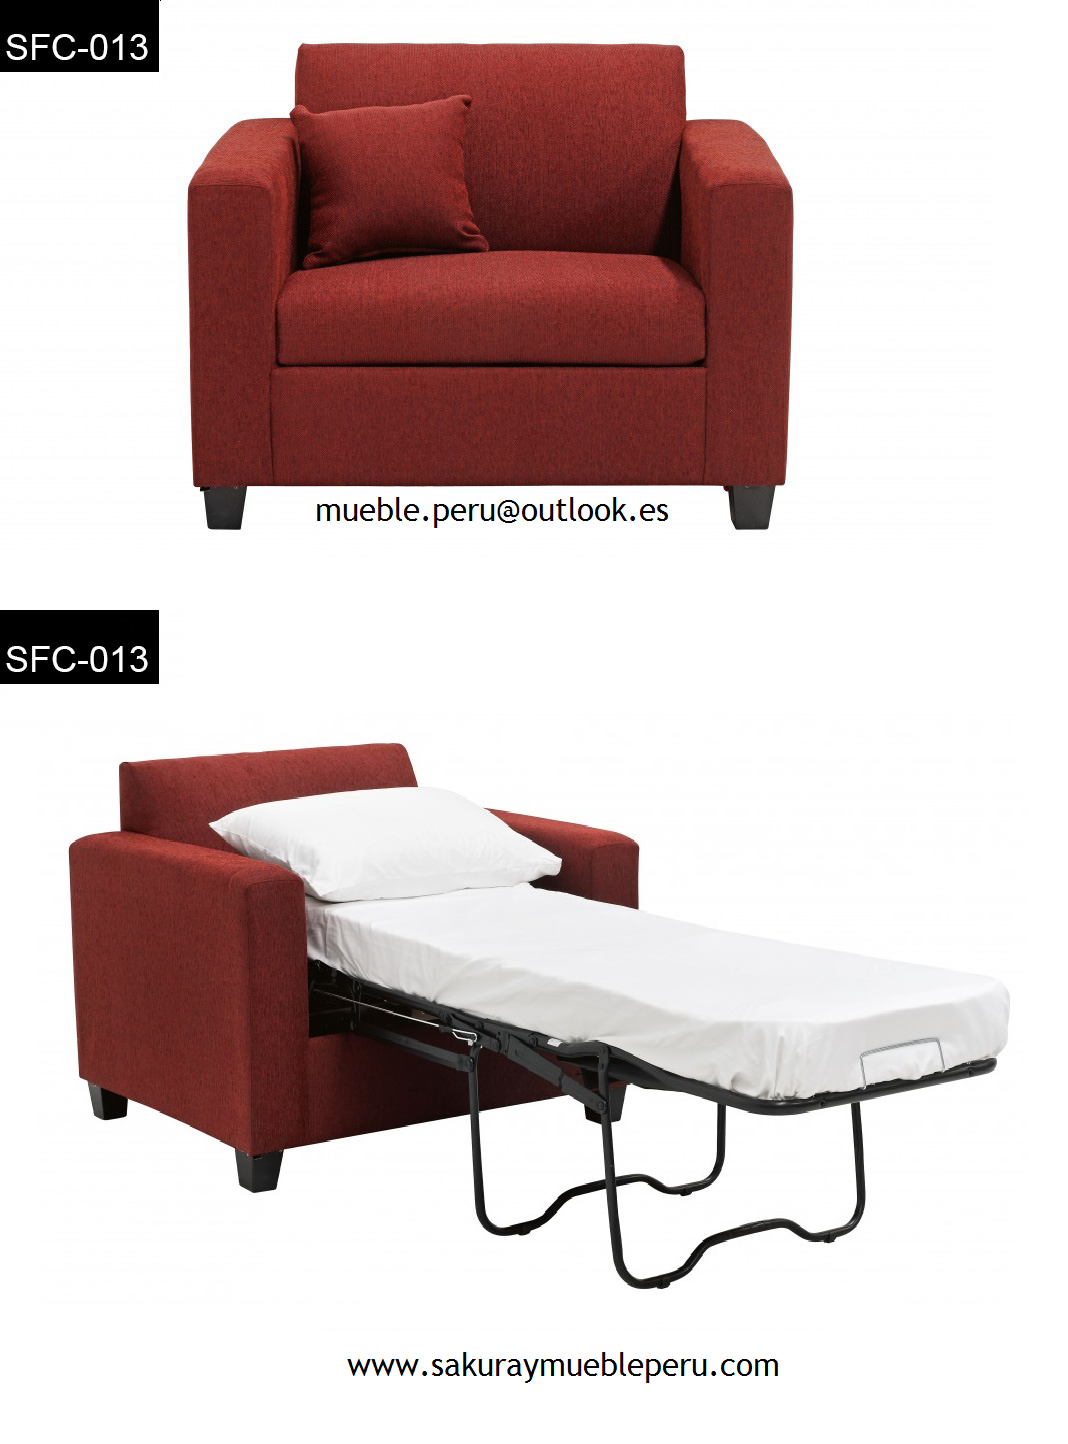 Donde Comprar Sofa Cama En Lima Peru   www.Gradschoolfairs.com